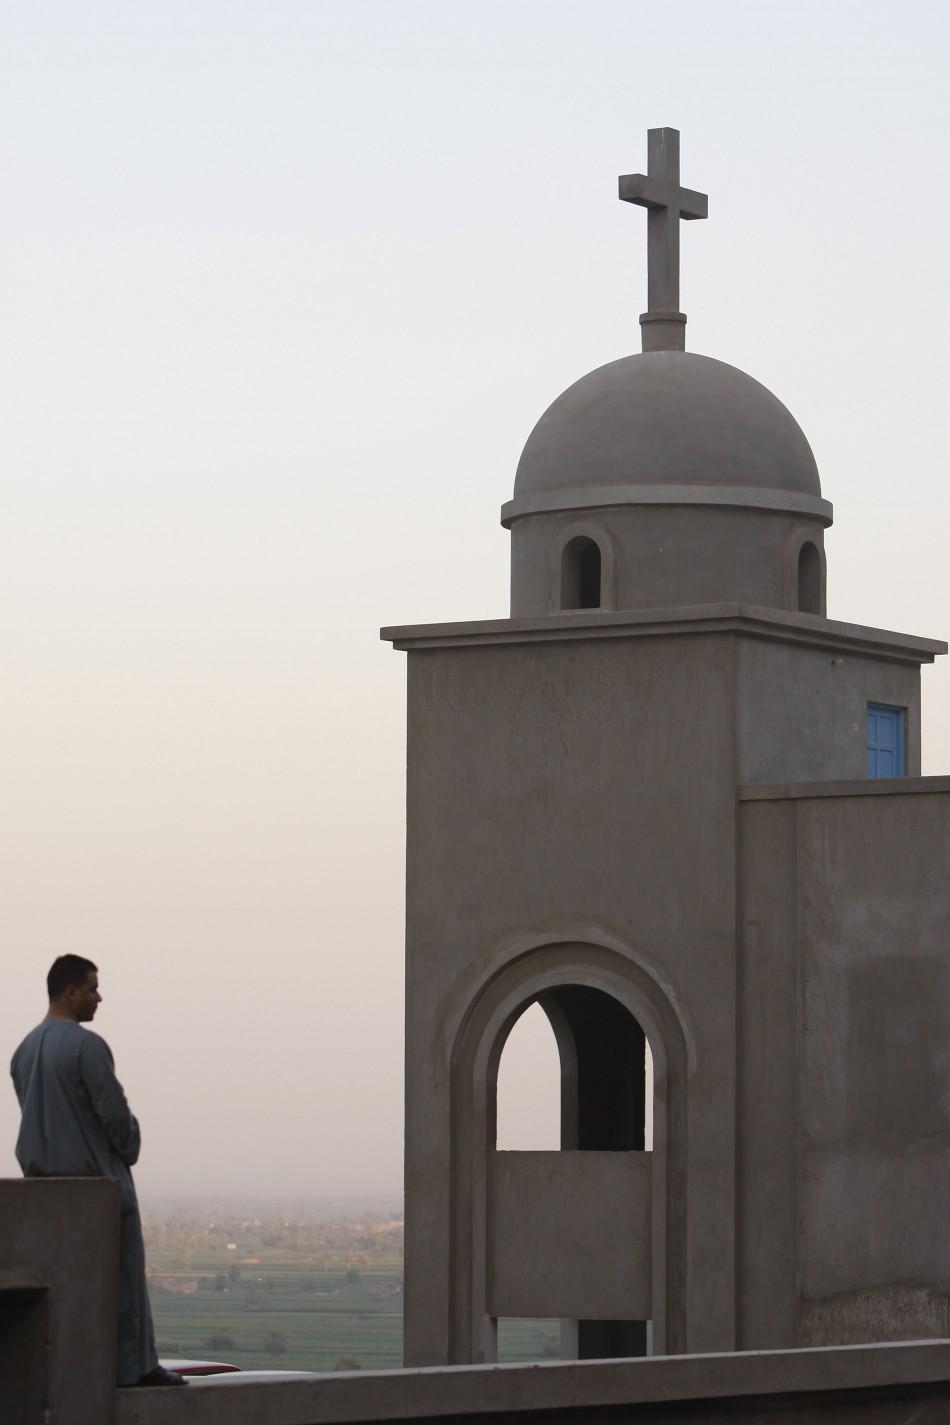 An Egyptian Coptic church Dronka village, outside Assiut, Egypt